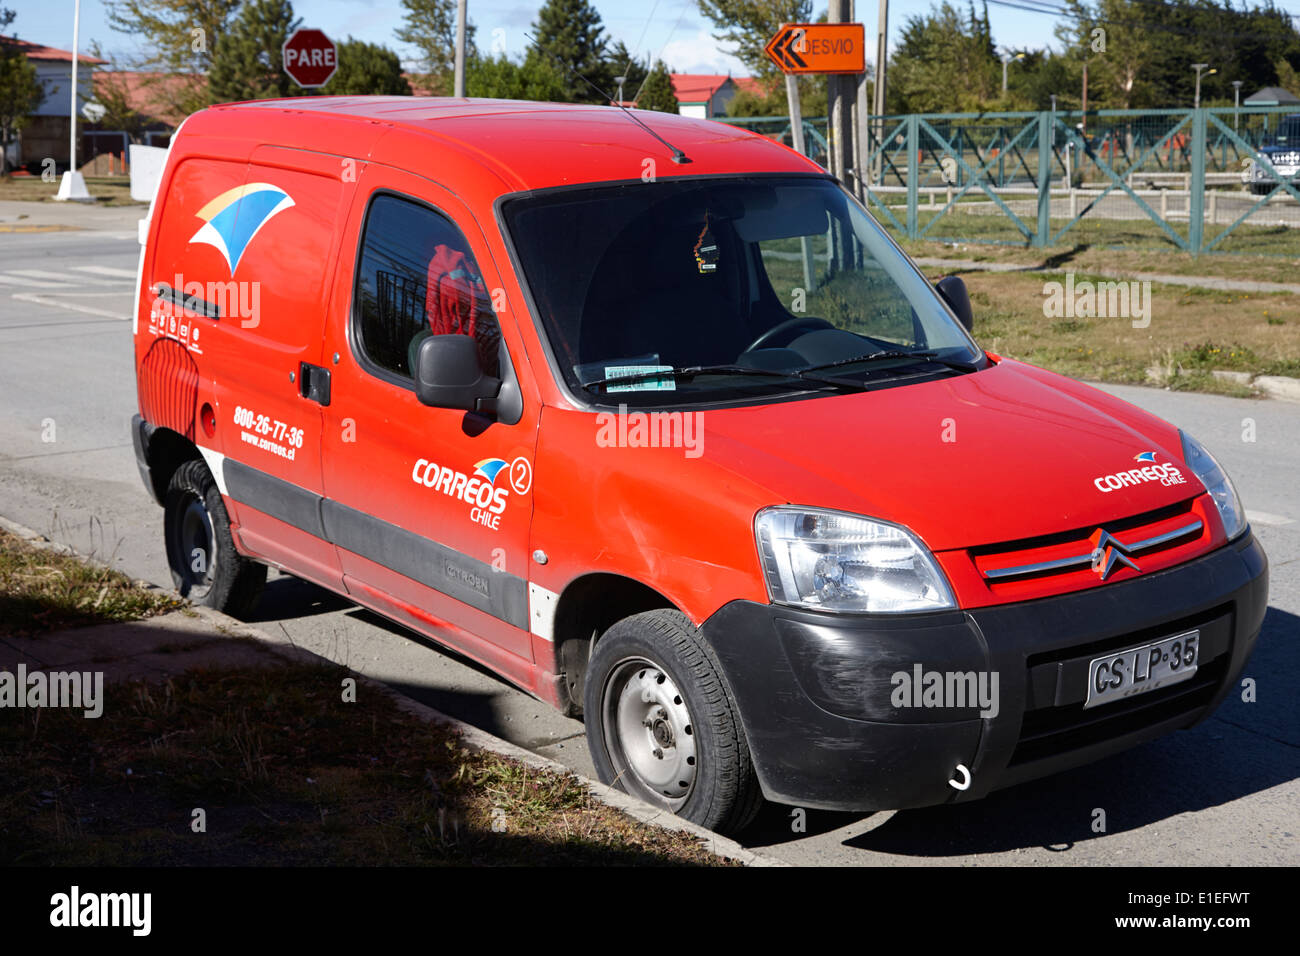 correos chile chilean post delivery van Punta Arenas Chile - Stock Image